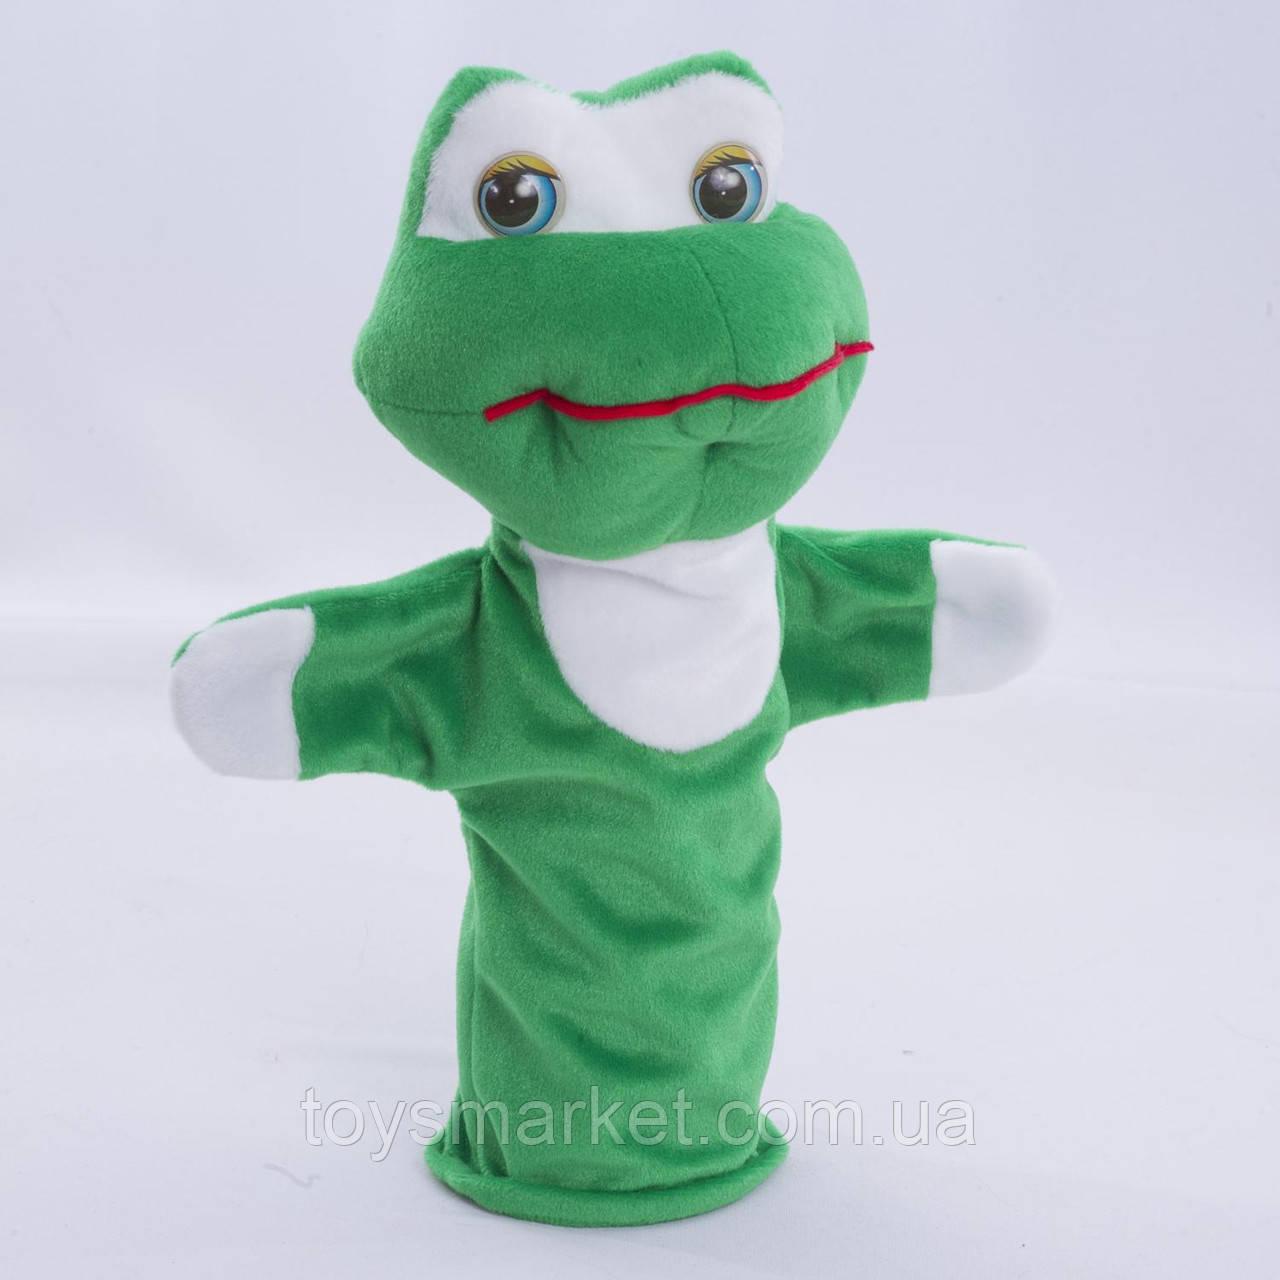 Детская мягкая игрушка,рукавичка,Лягушка